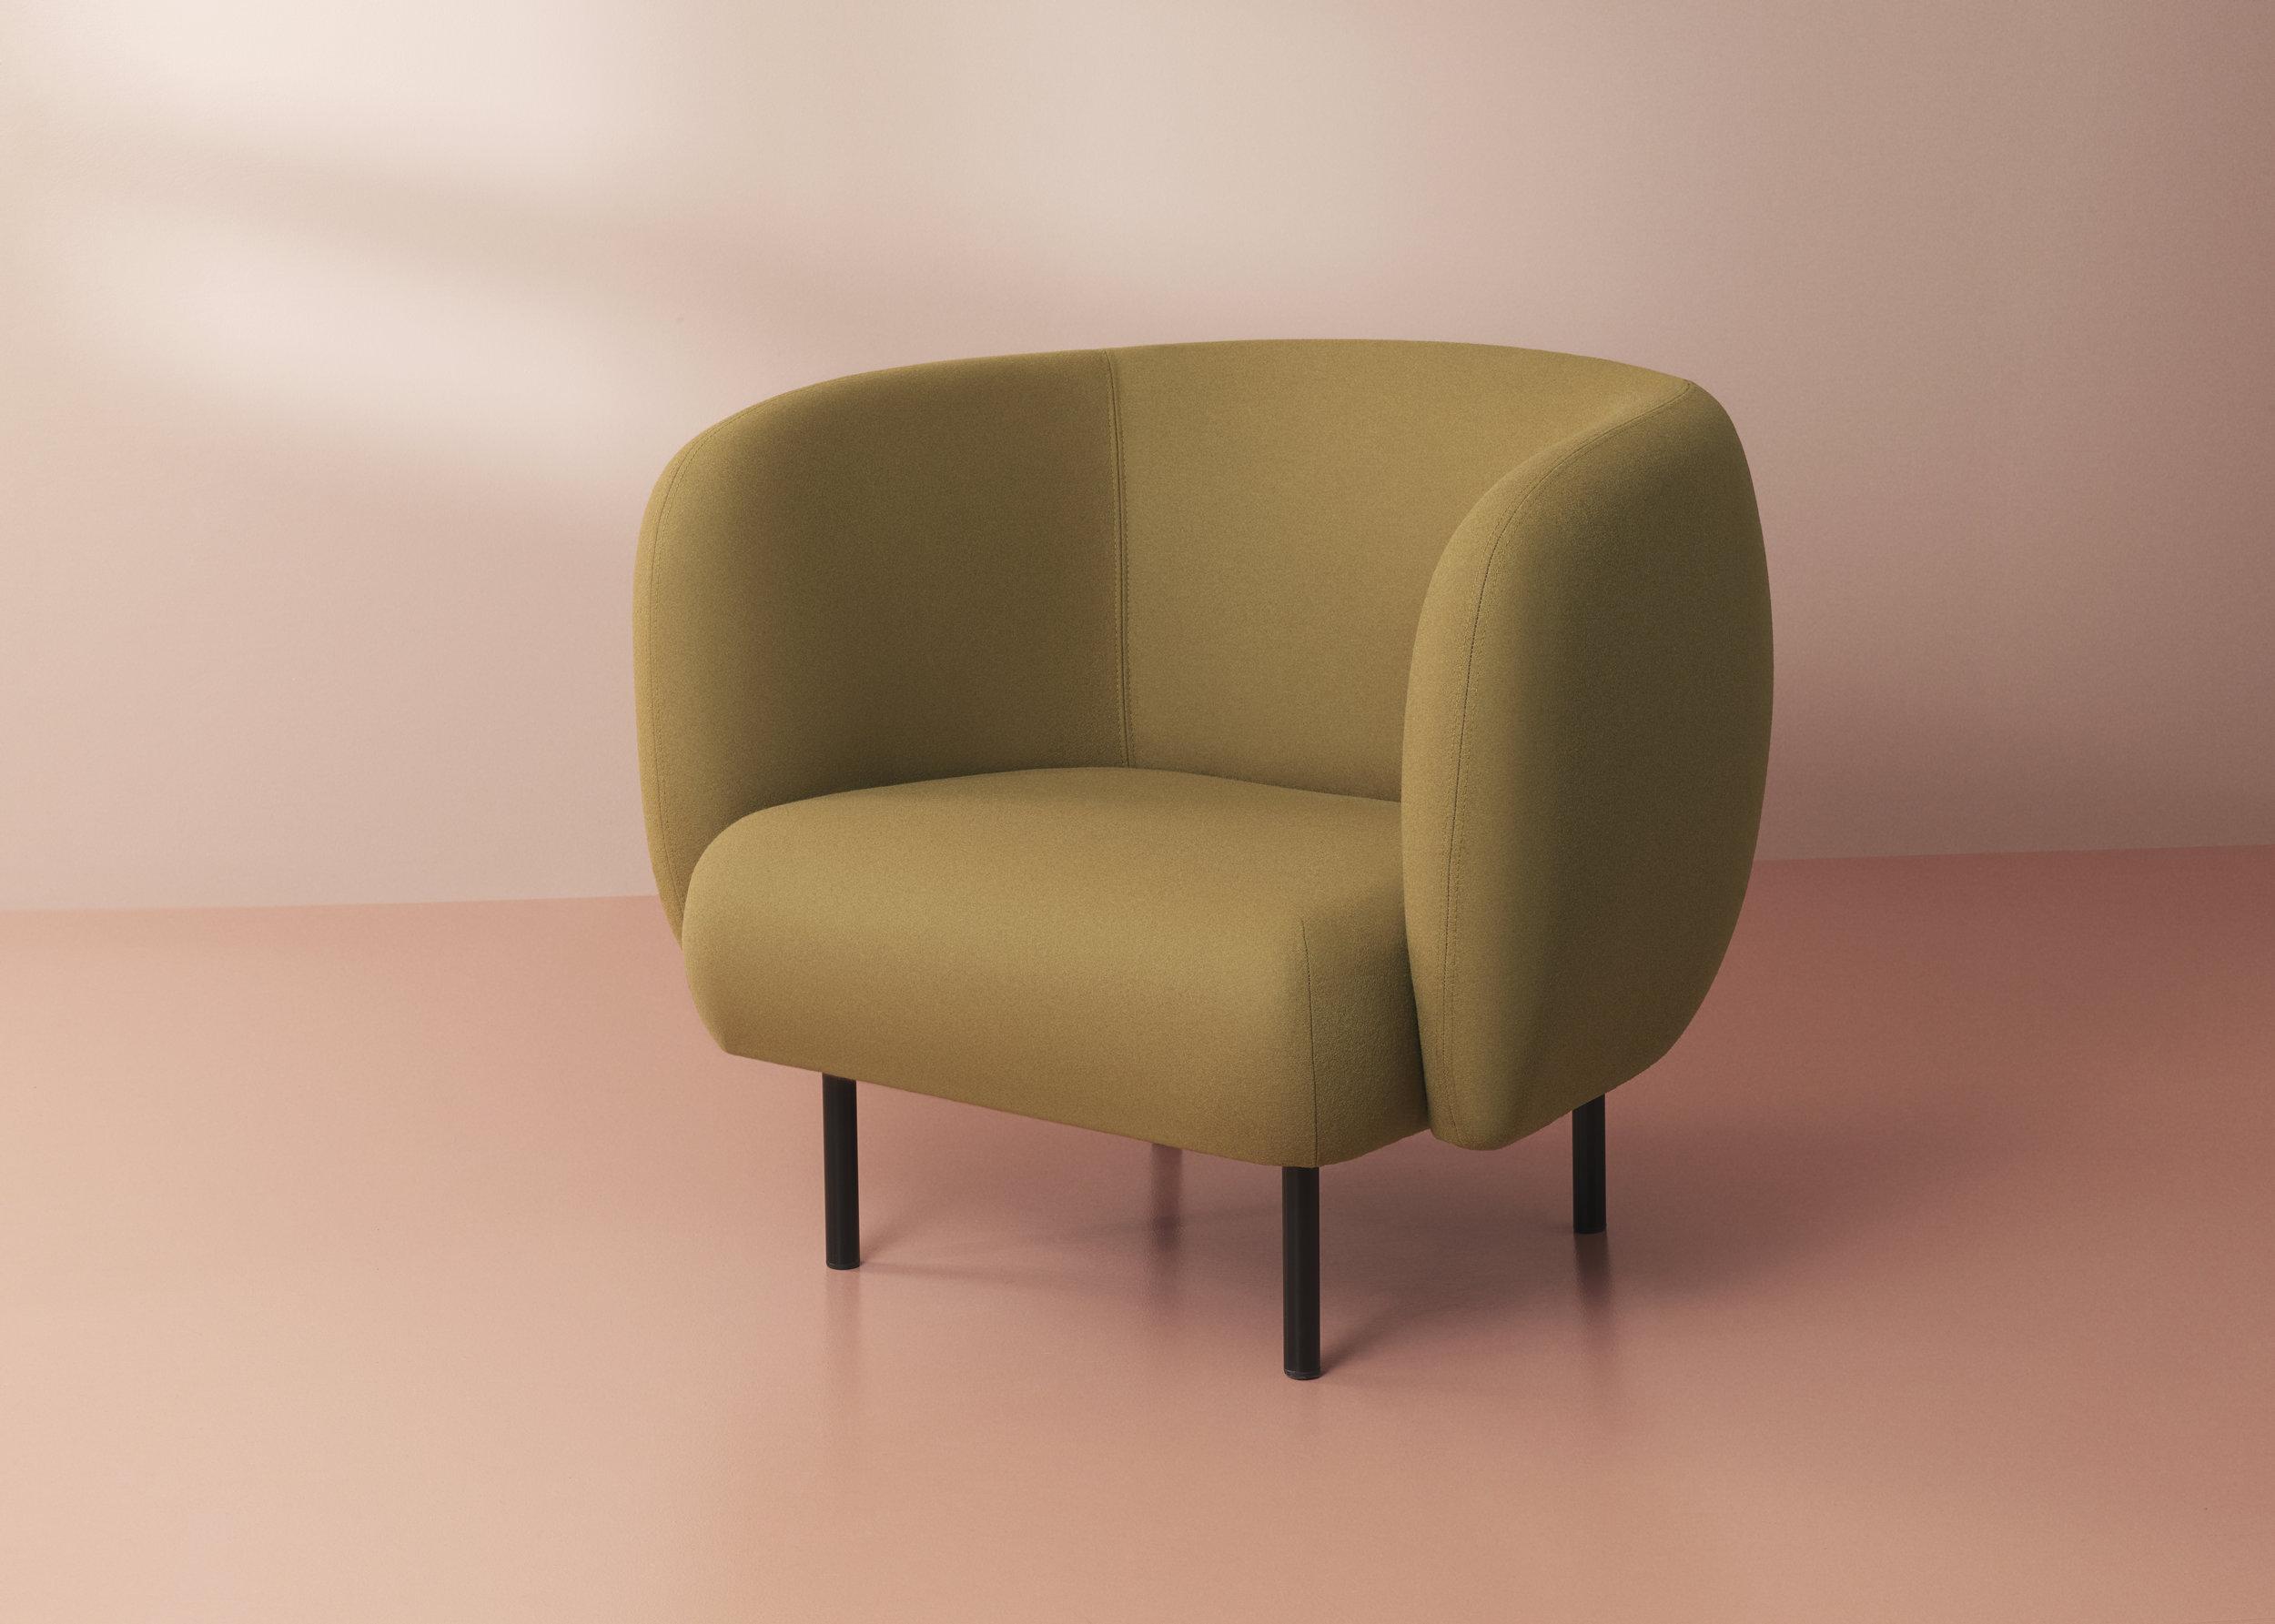 2201010-warmnordic-furniture-cape-loungechair-olive-vnude.jpg